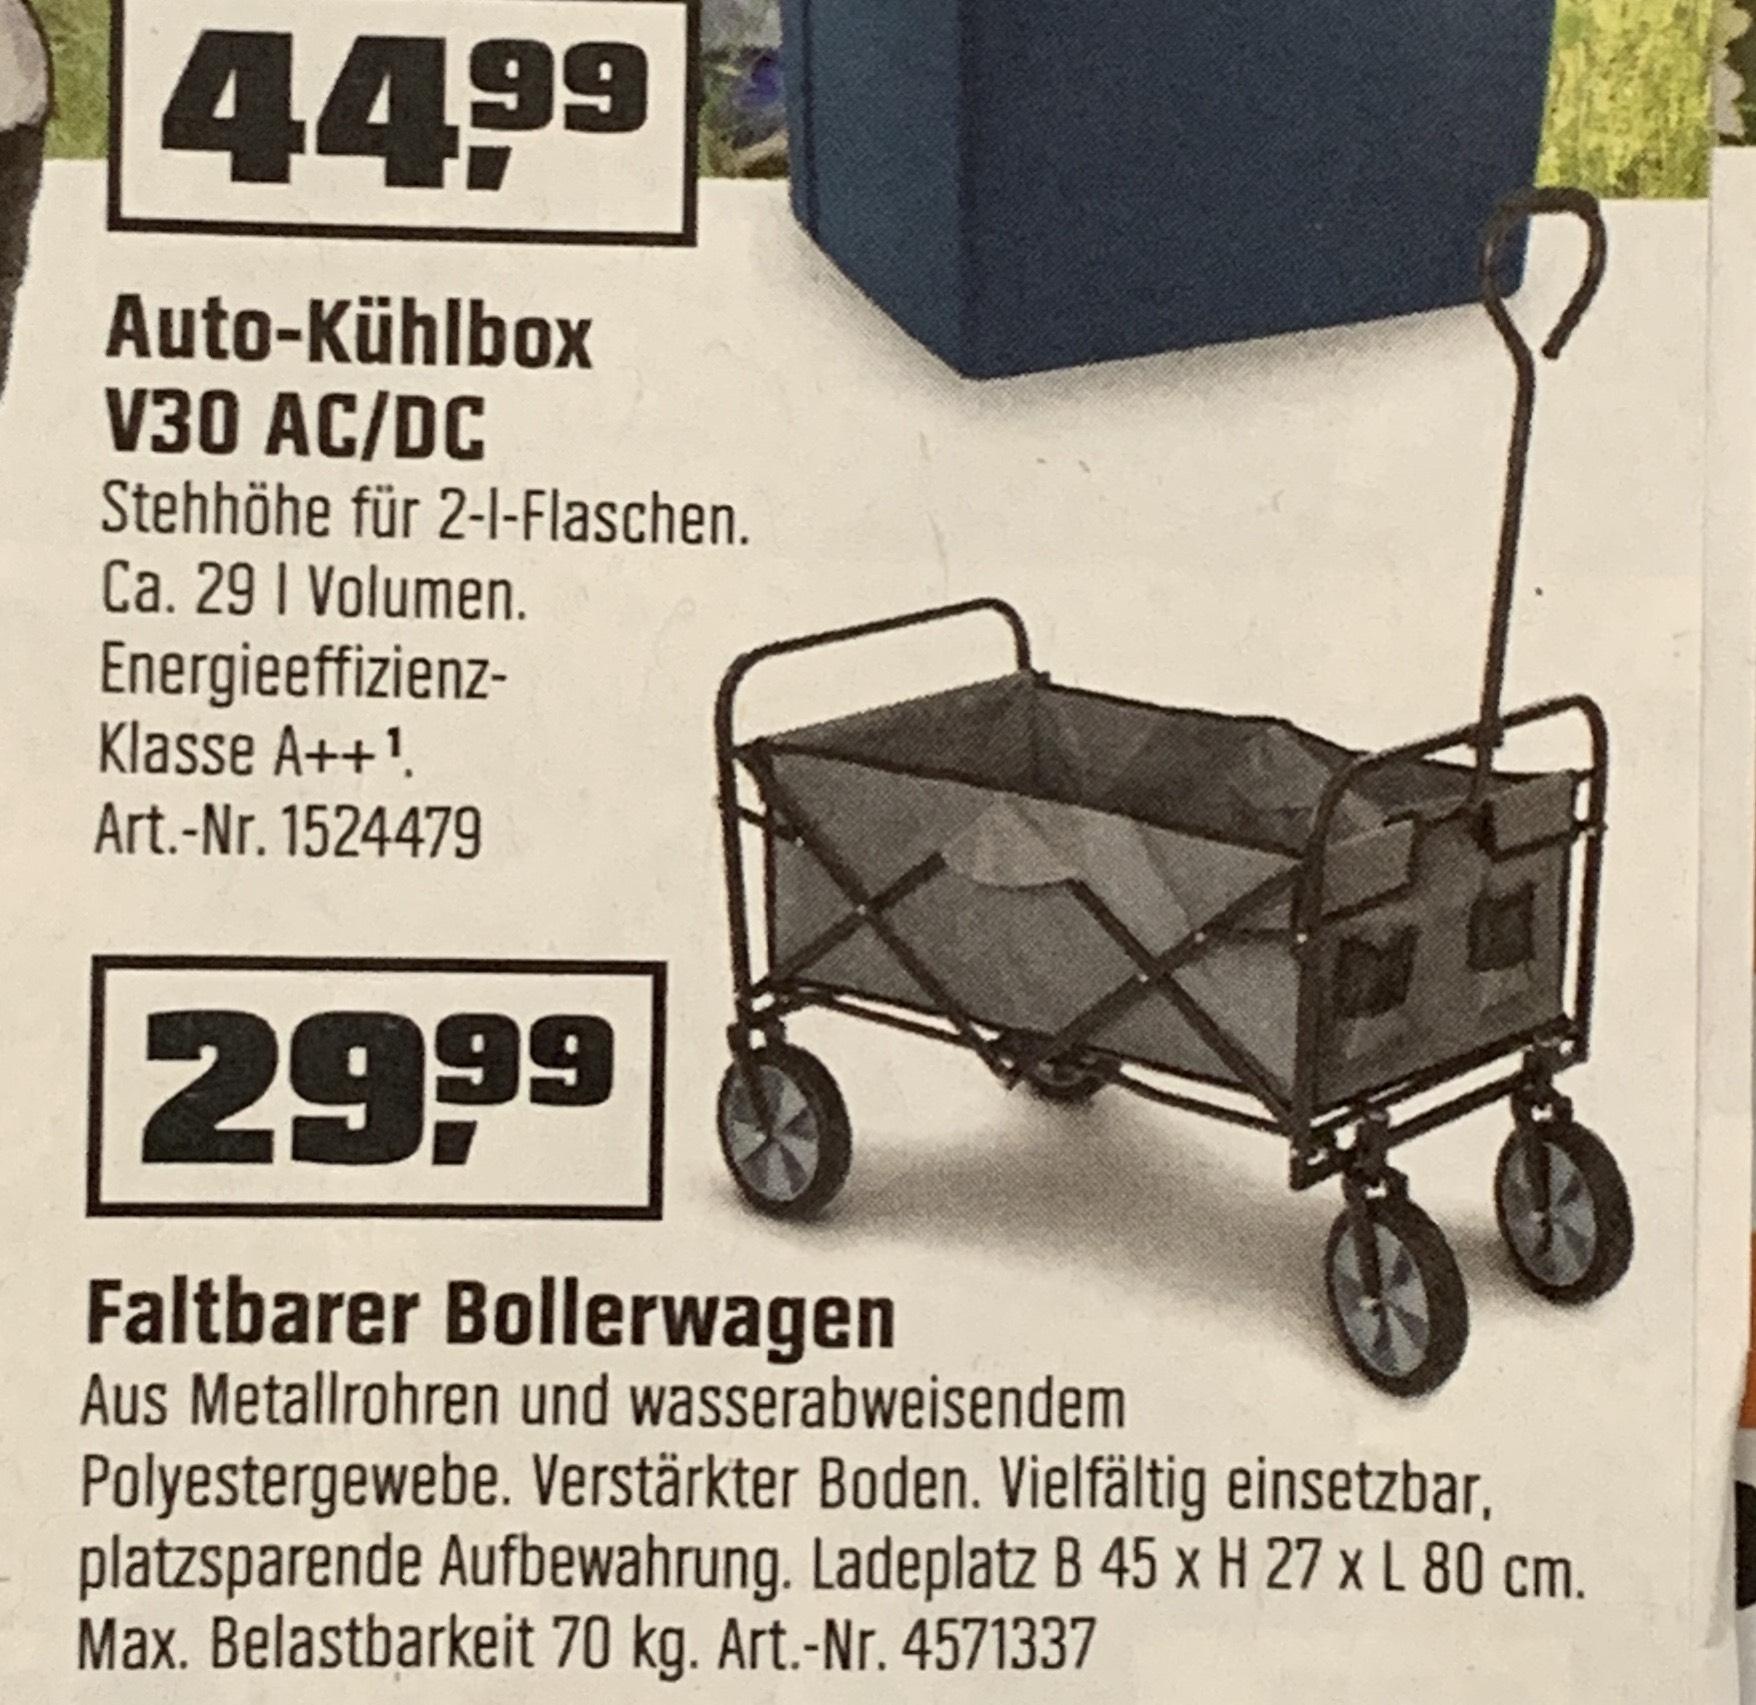 Obi Faltbarer Bollerwagen 70kg 2999 Mydealzde